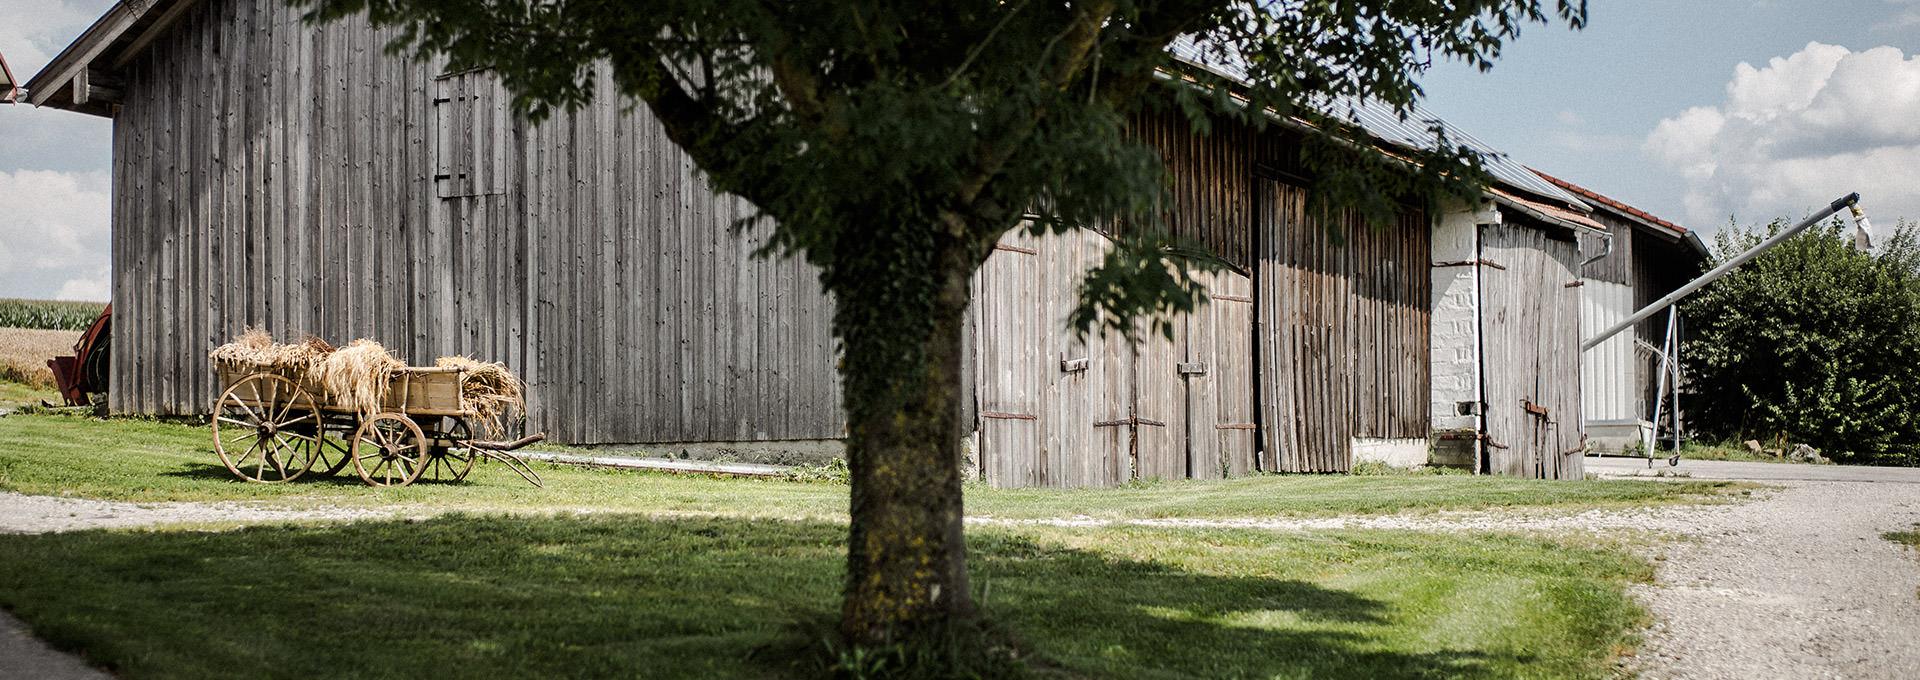 Hofbauernhof-Schemmer-Innenhof